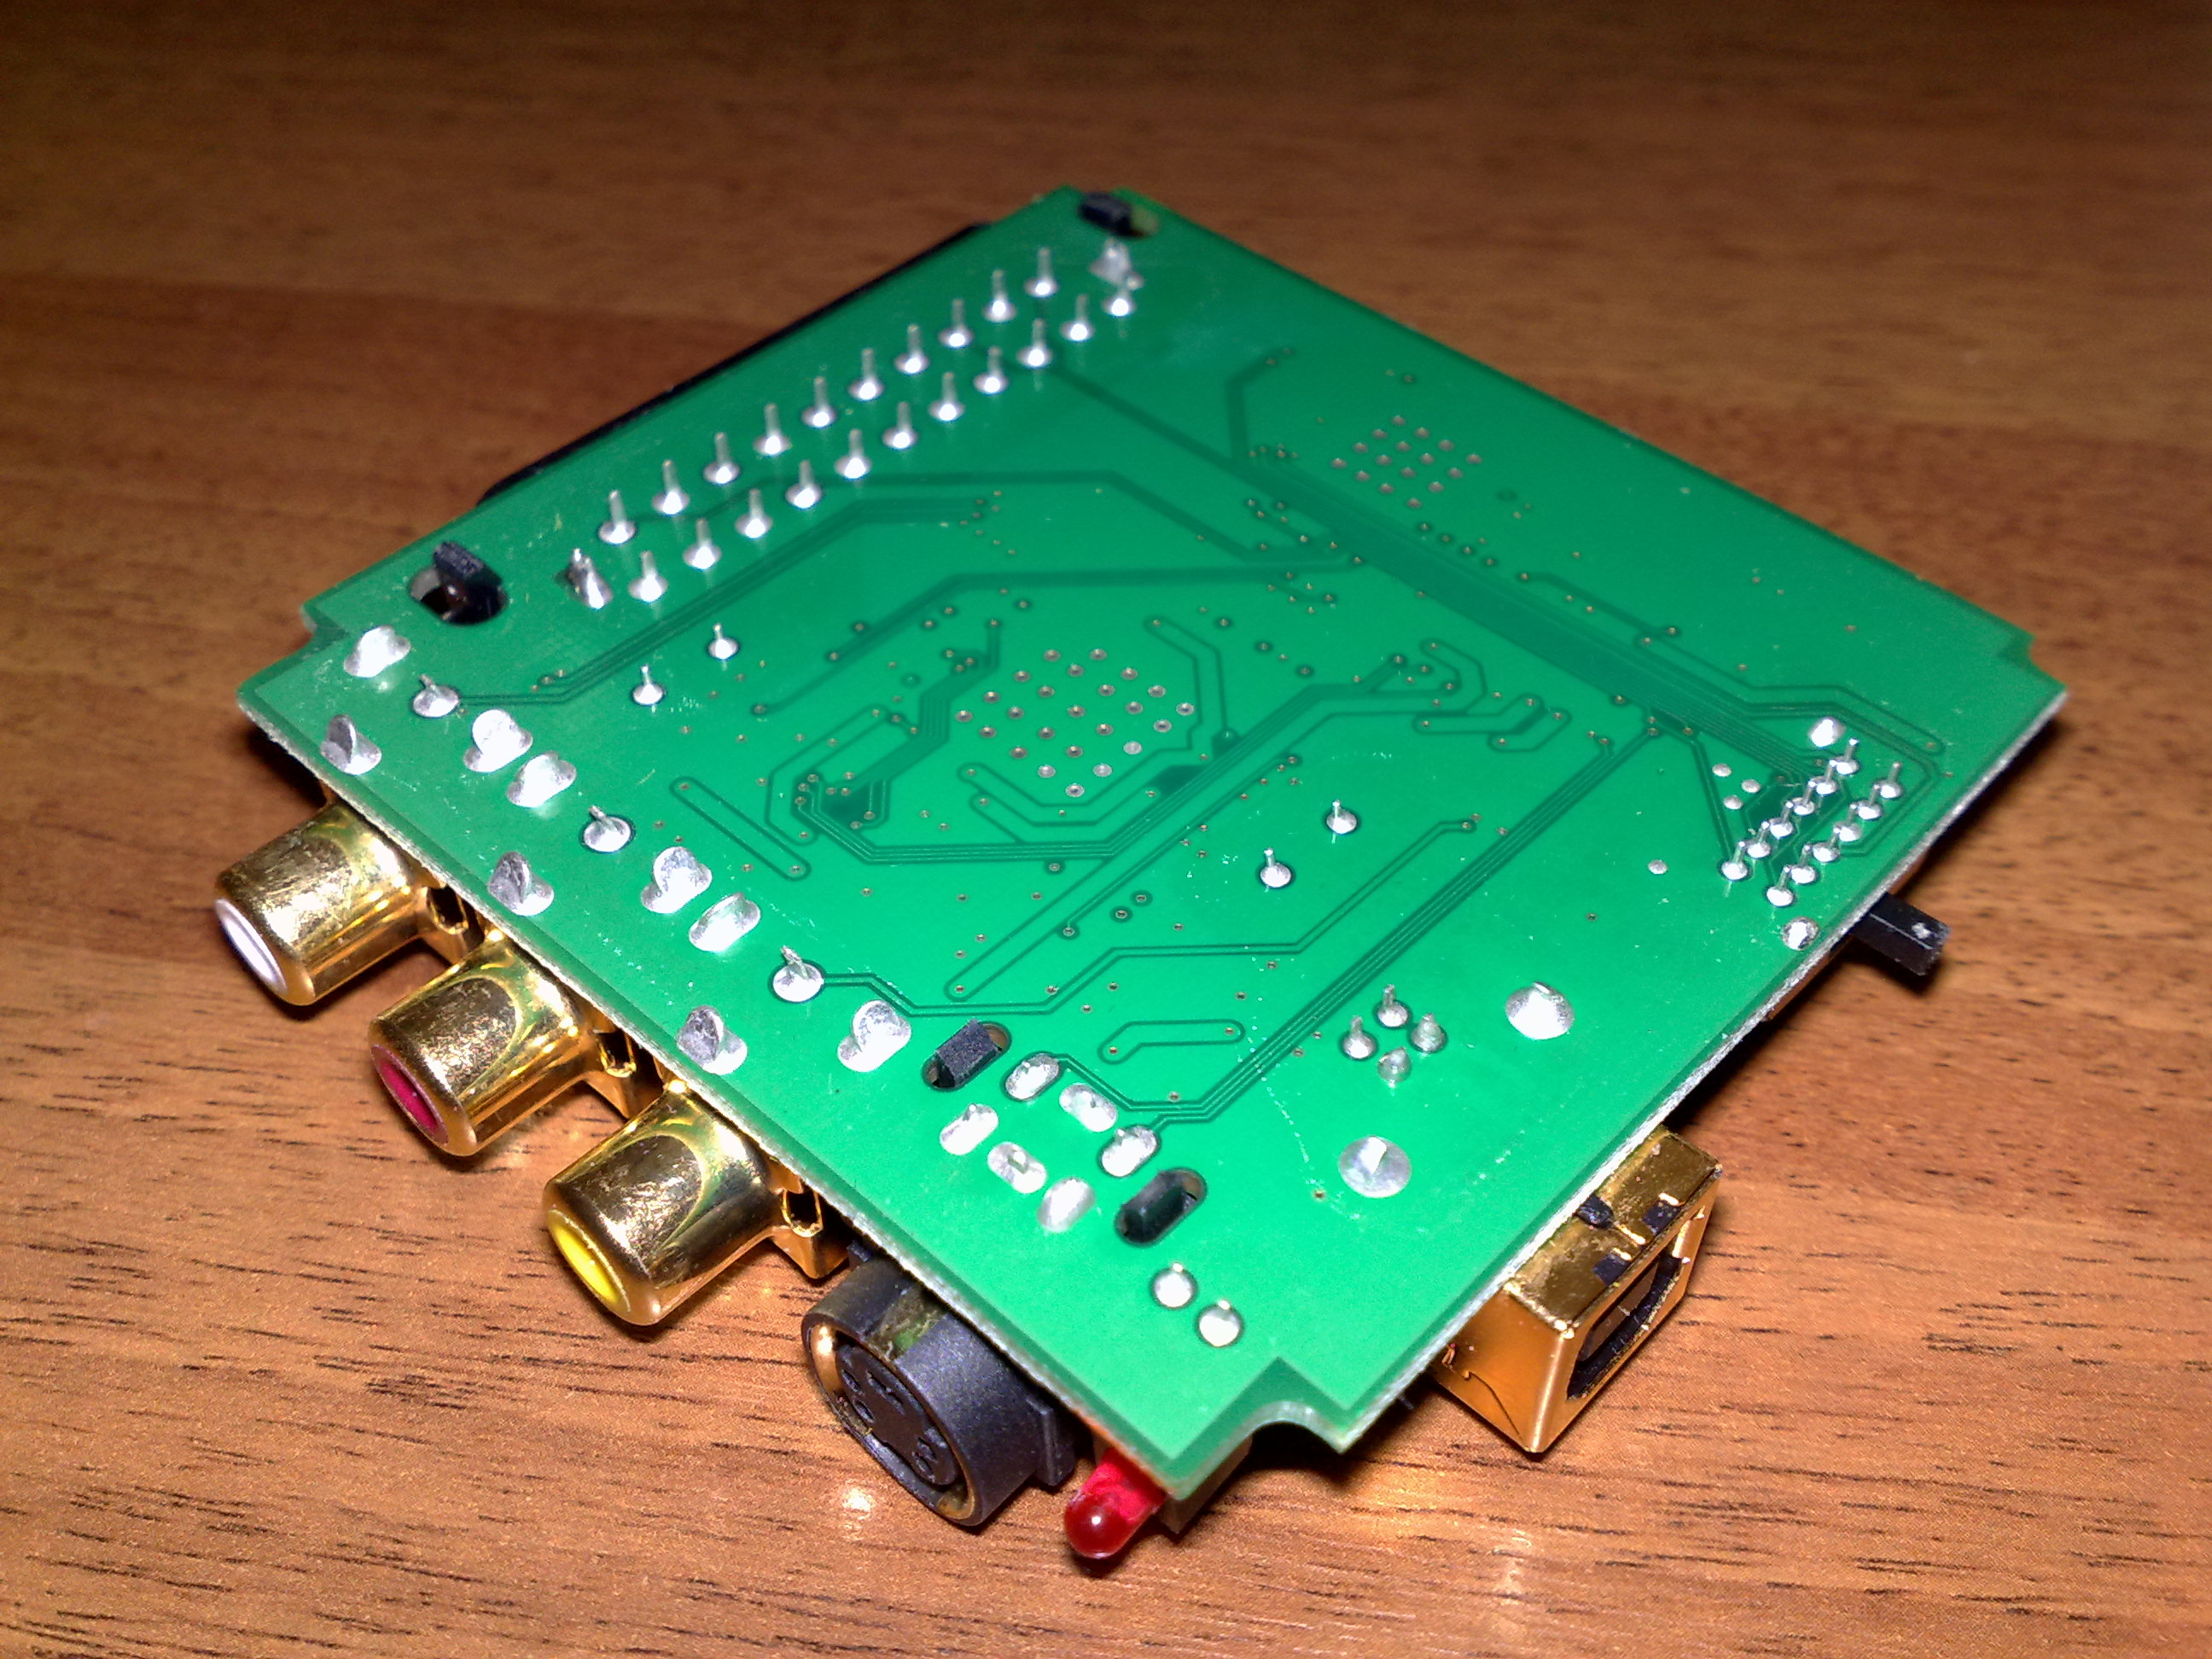 file terratec g3 circuit board 2 jpg wikimedia commons rh commons wikimedia org circuit board 250520 circuit board 200429gs